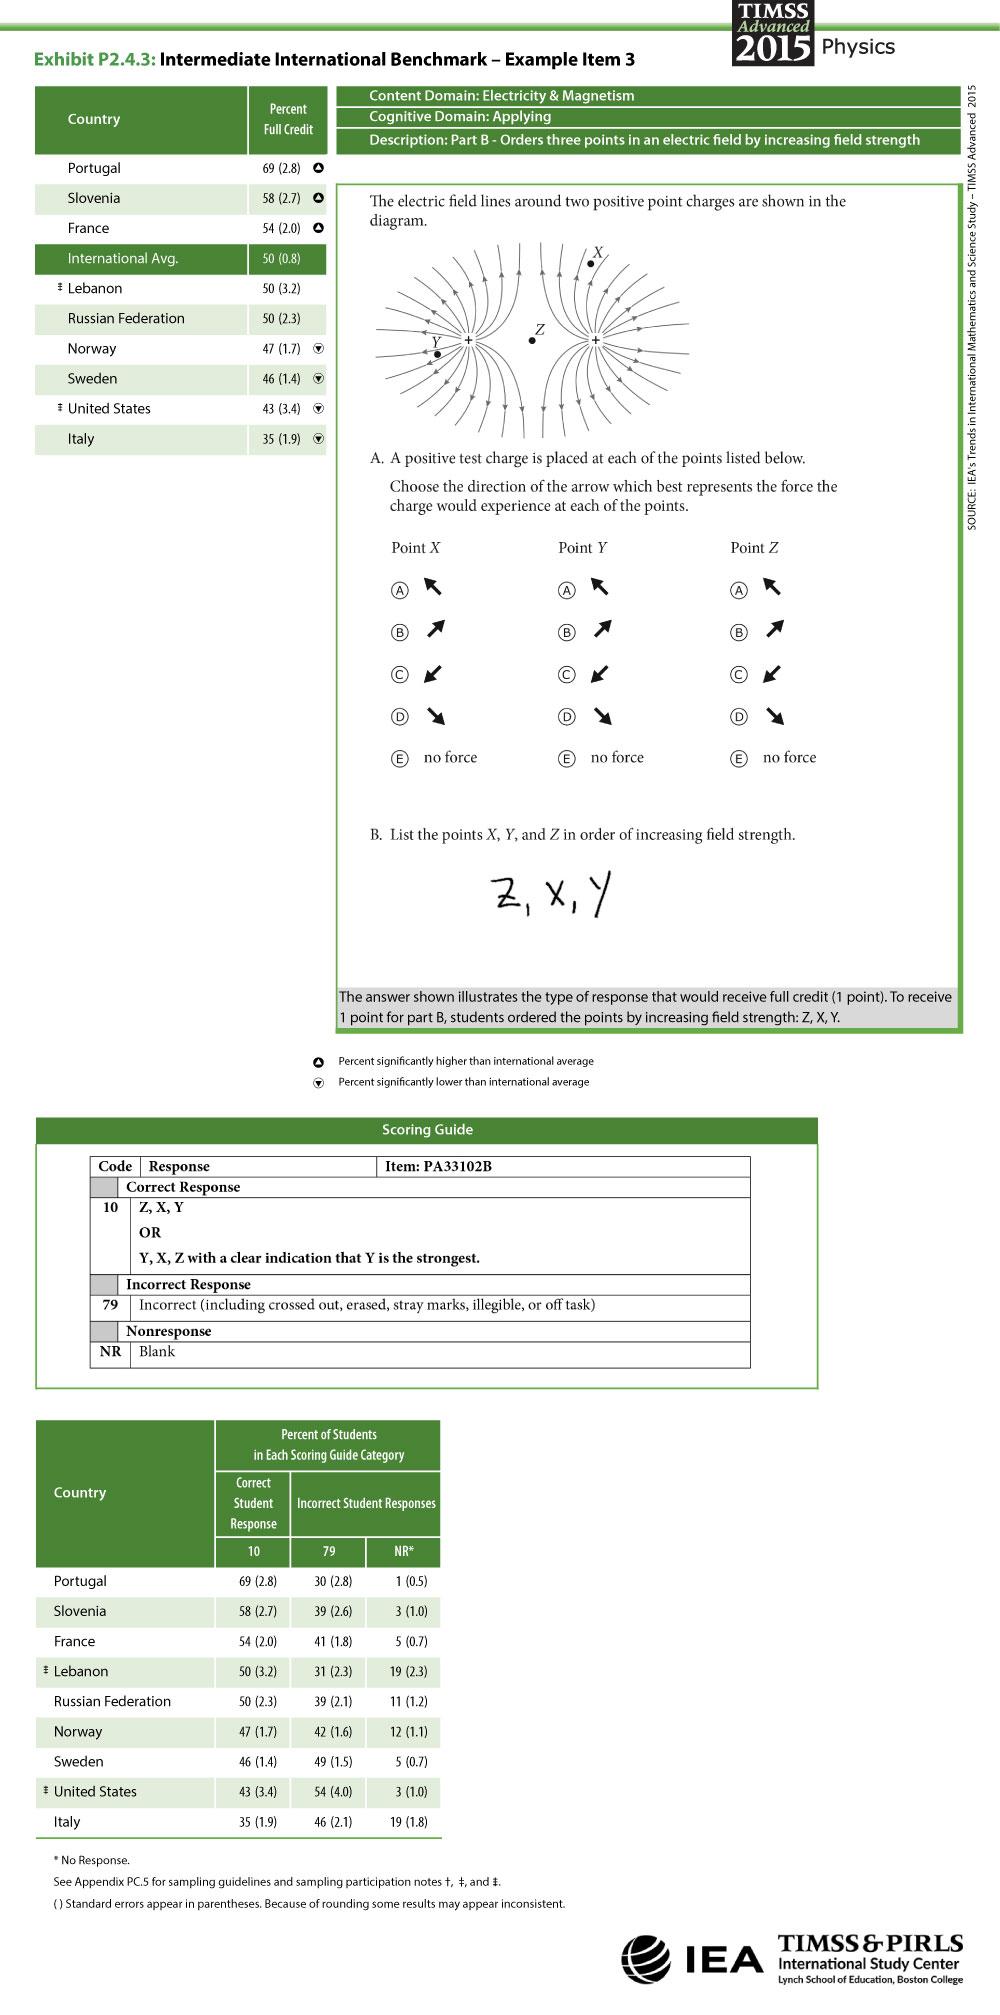 Intermediate International Benchmark Item 3